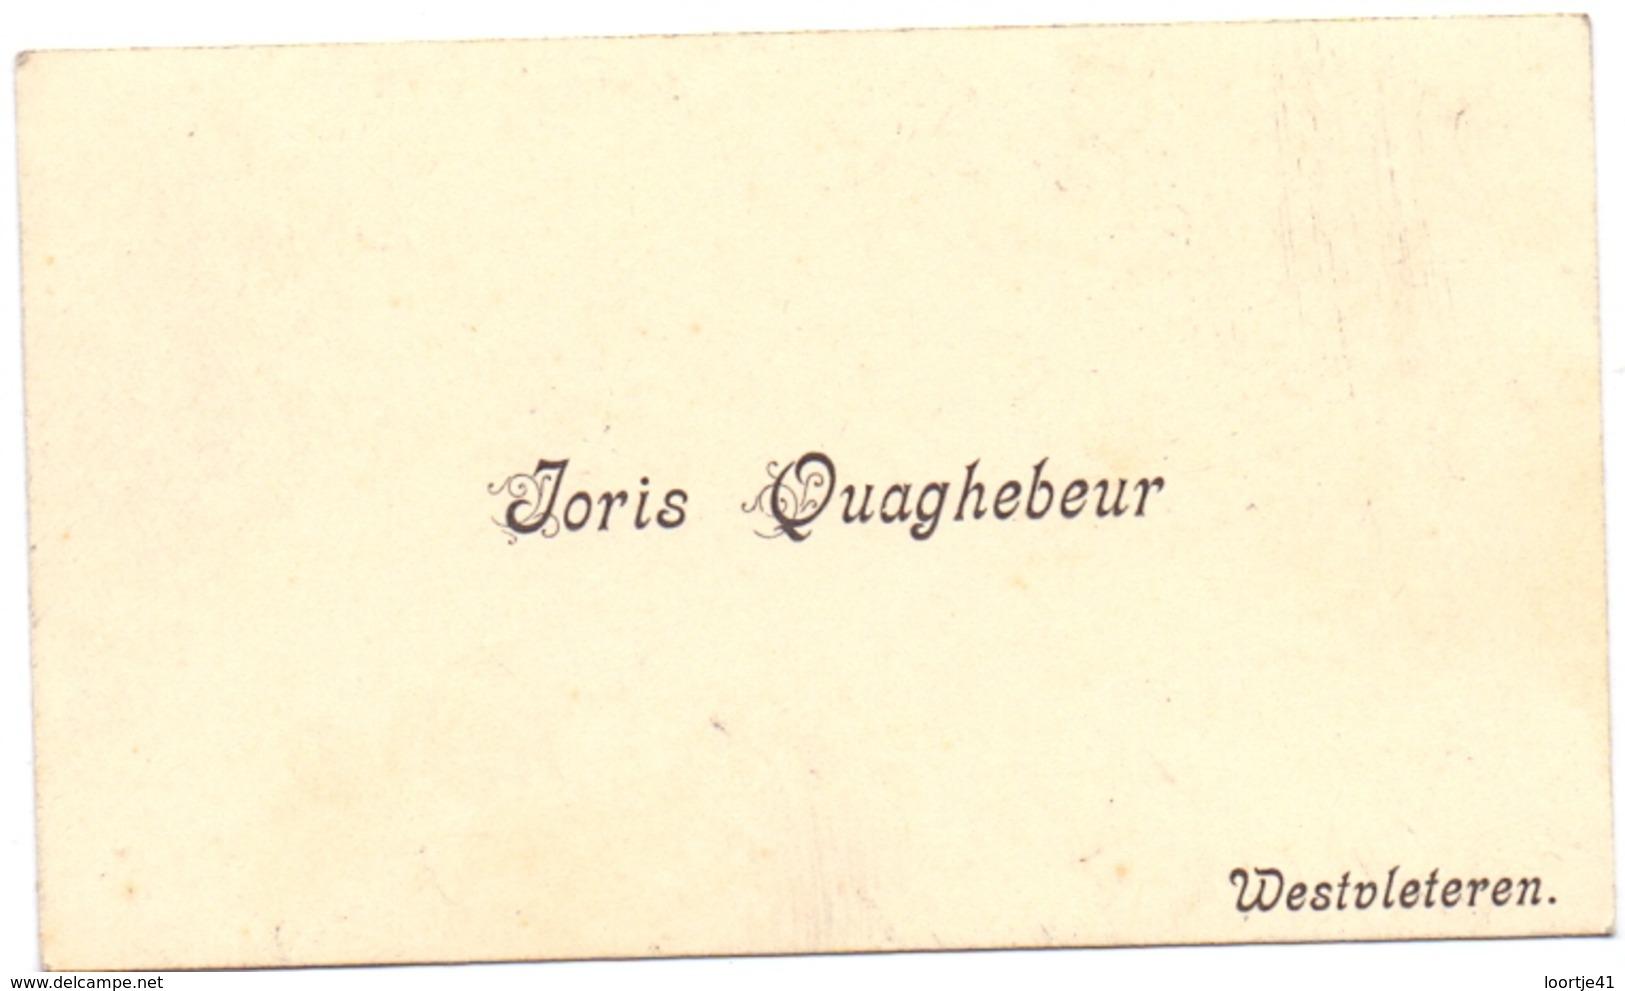 Visitekaartje - Carte Visite - Joris Quaghebeur - Westvleteren - Cartes De Visite